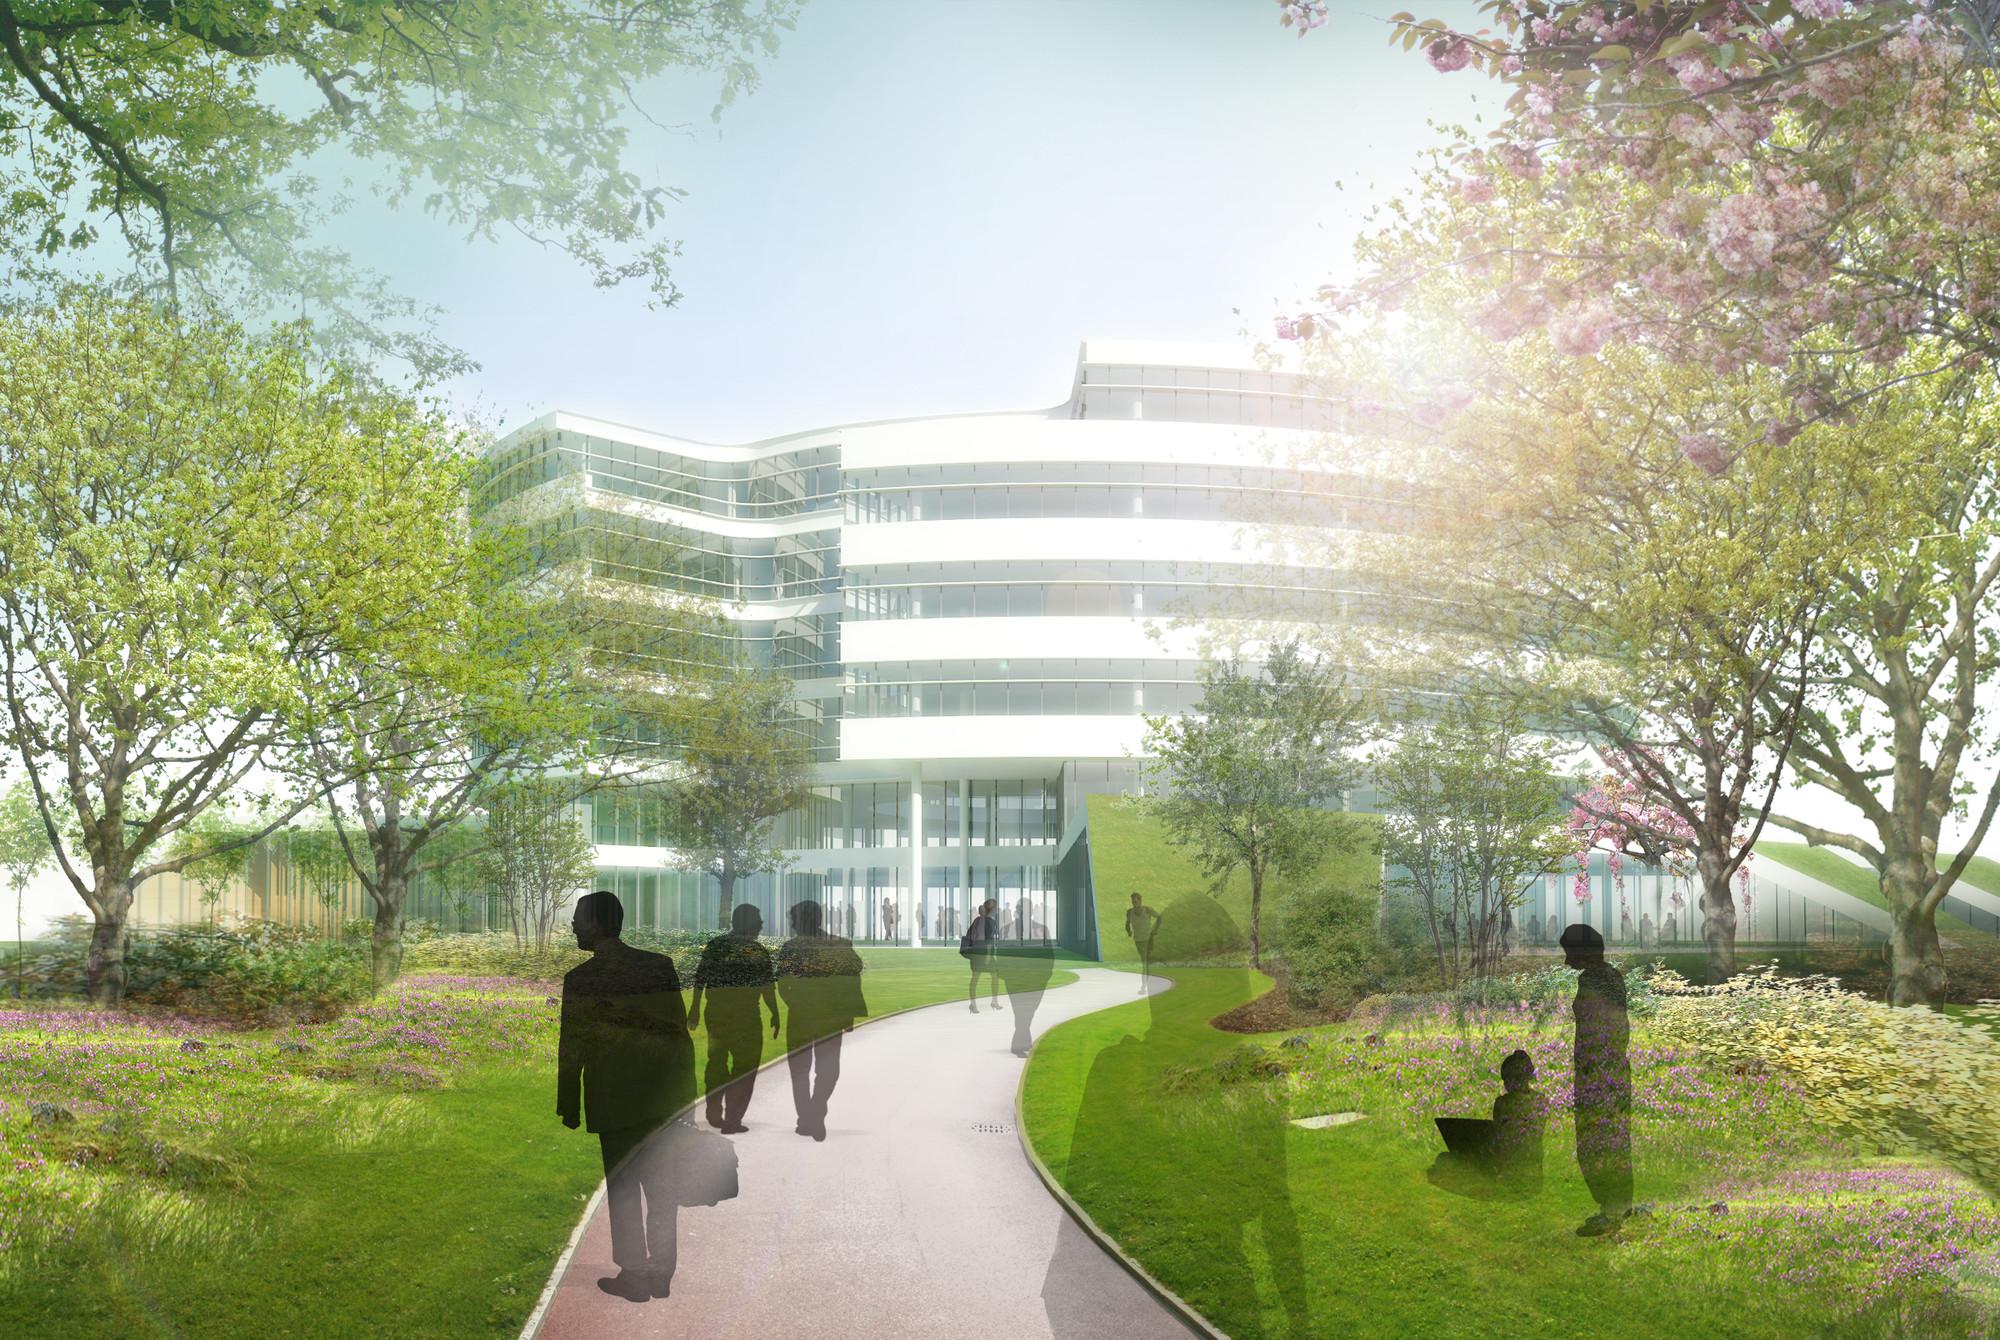 Novo Nordisk Corporate Centre / Henning Larsen Architects